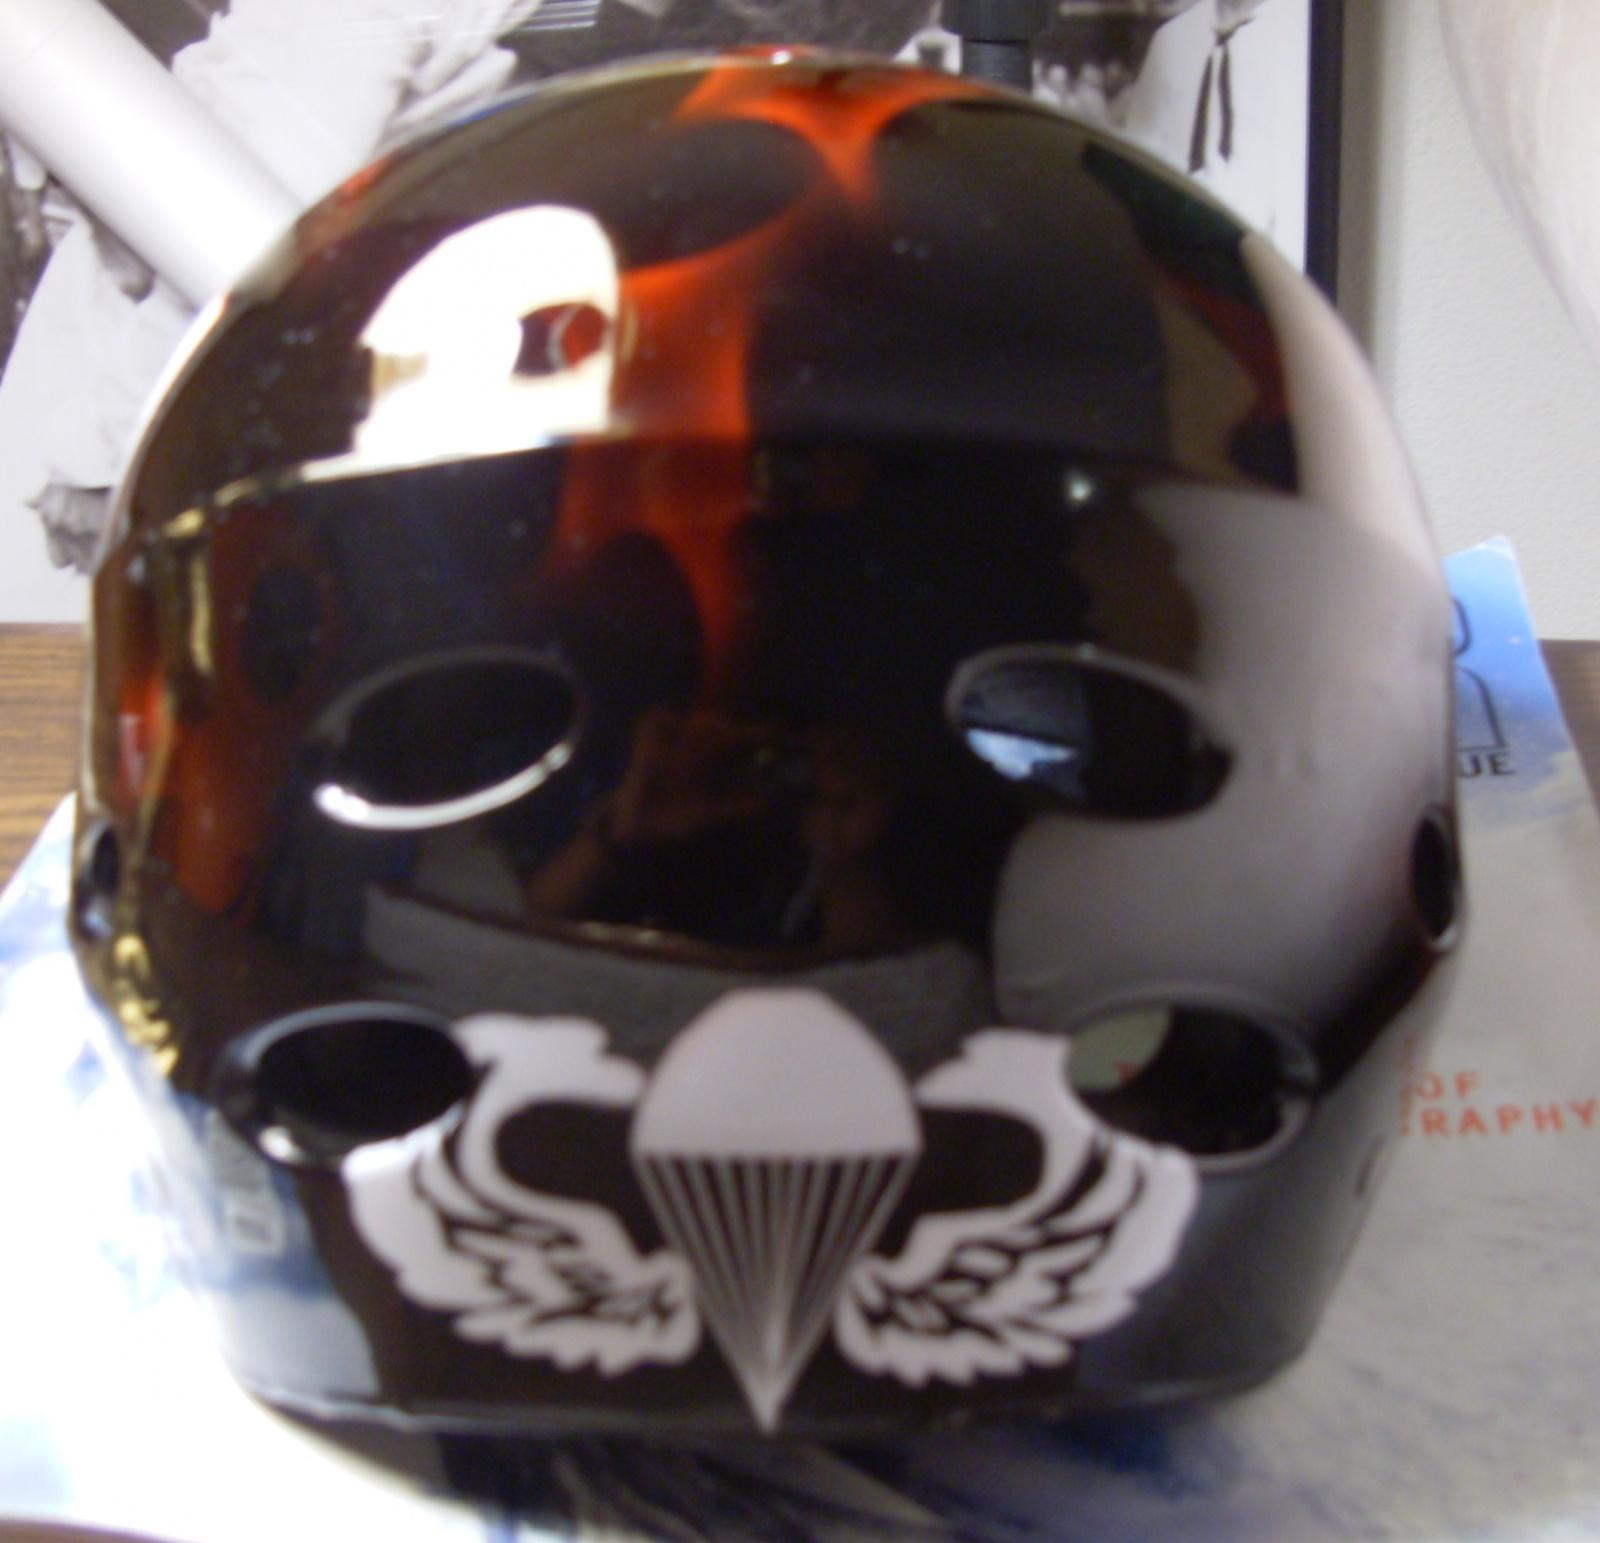 Click image for larger version  Name:Custom kayak helmet 018.jpg Views:201 Size:426.9 KB ID:846